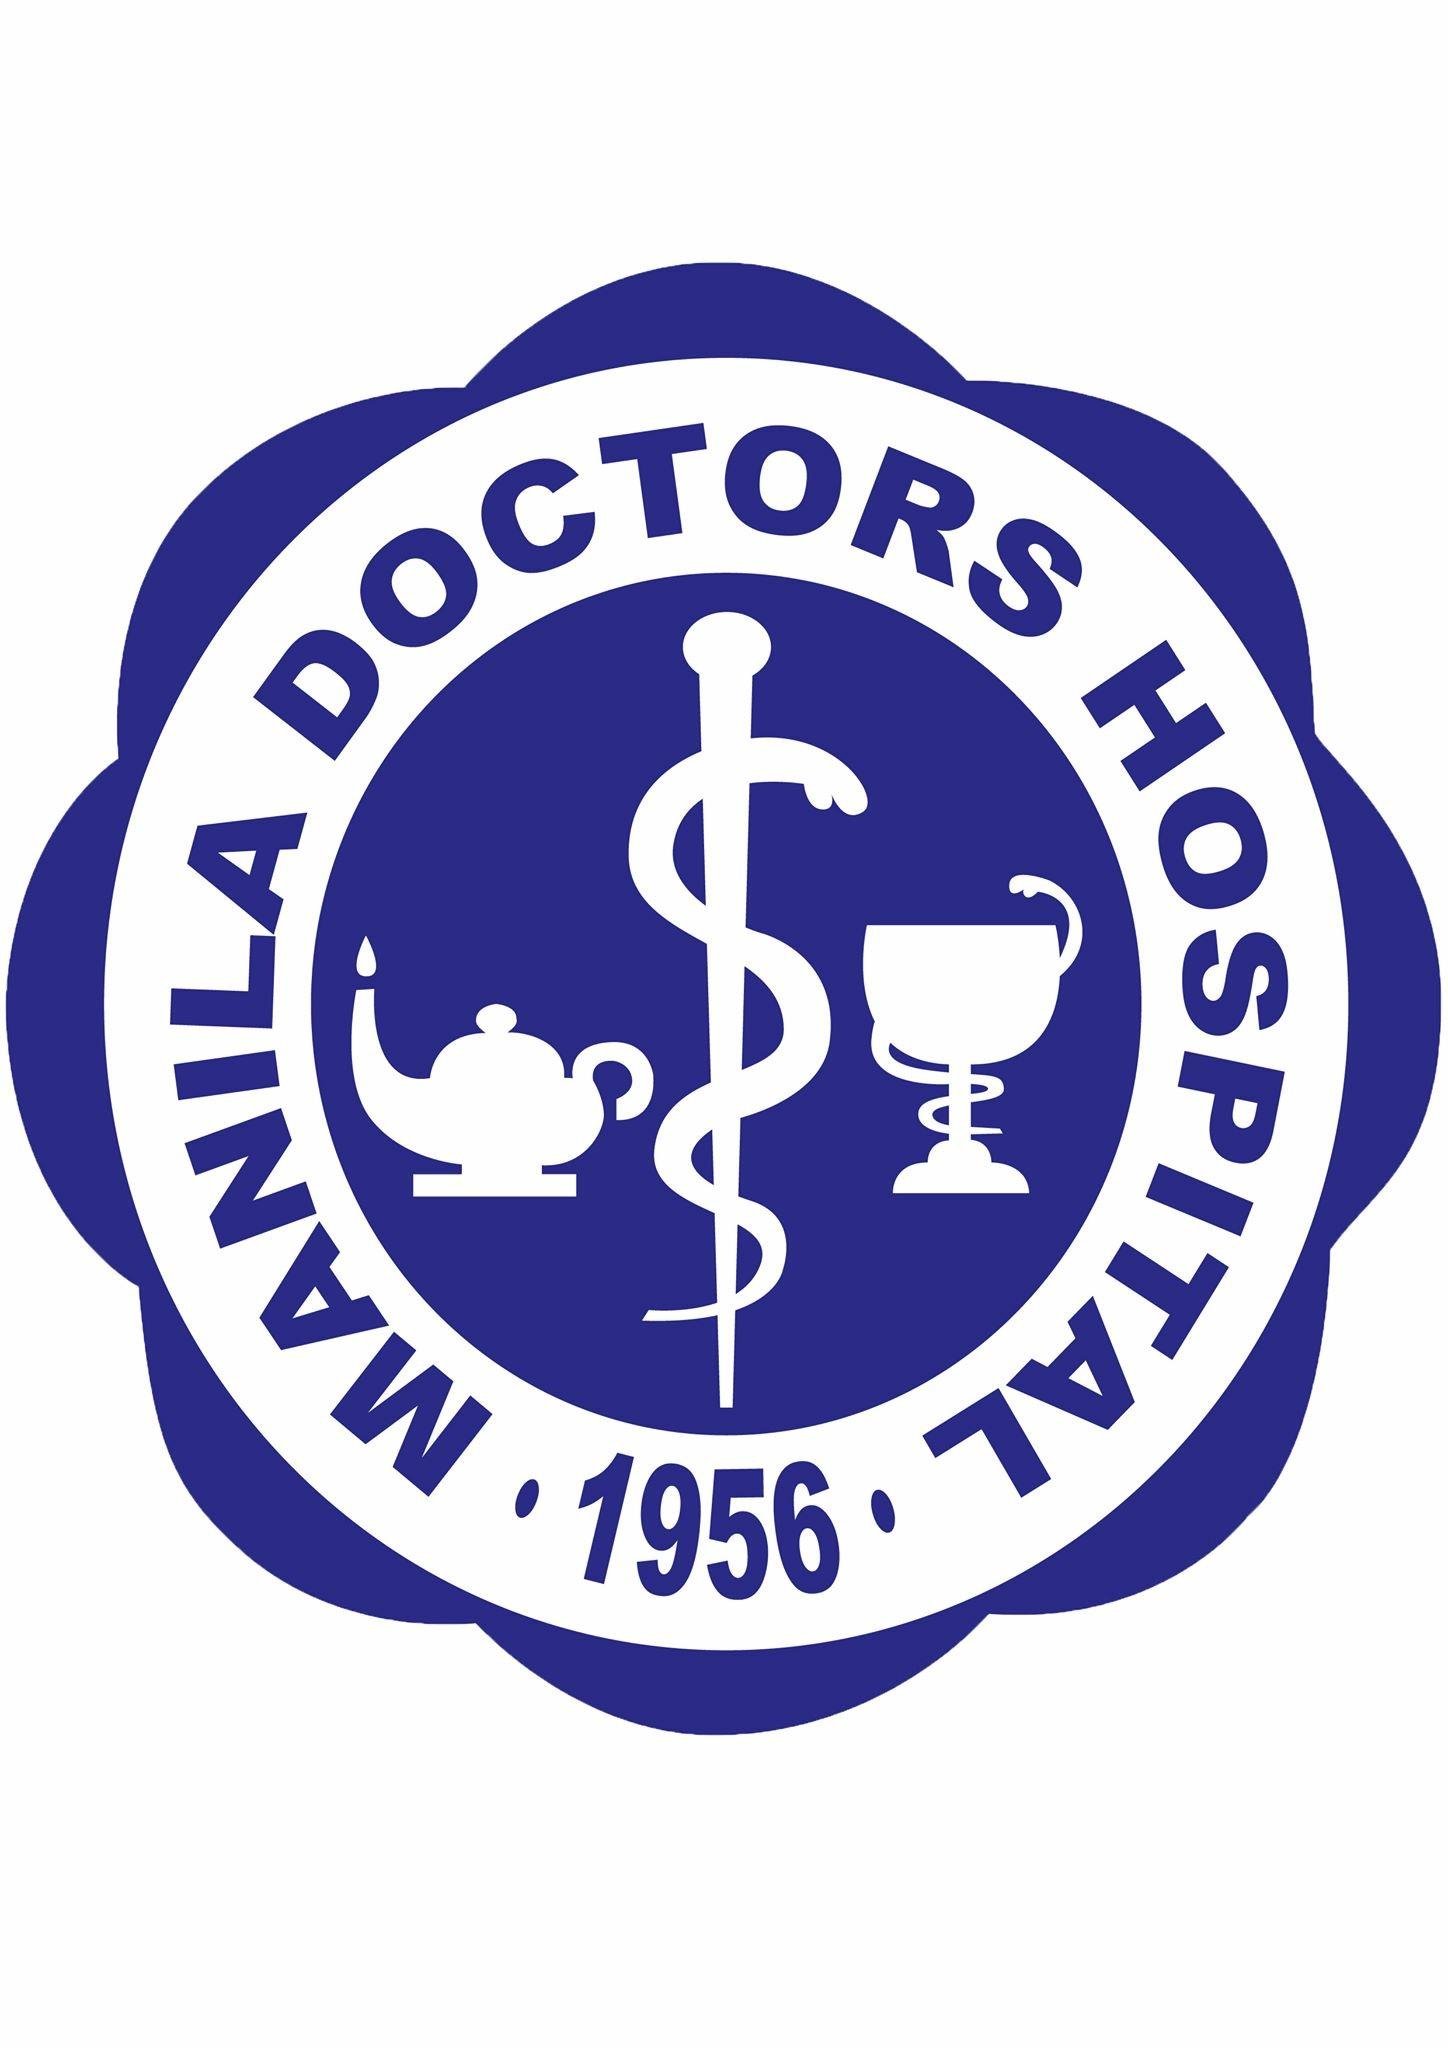 Manila Doctors Hospital - Room No. 216